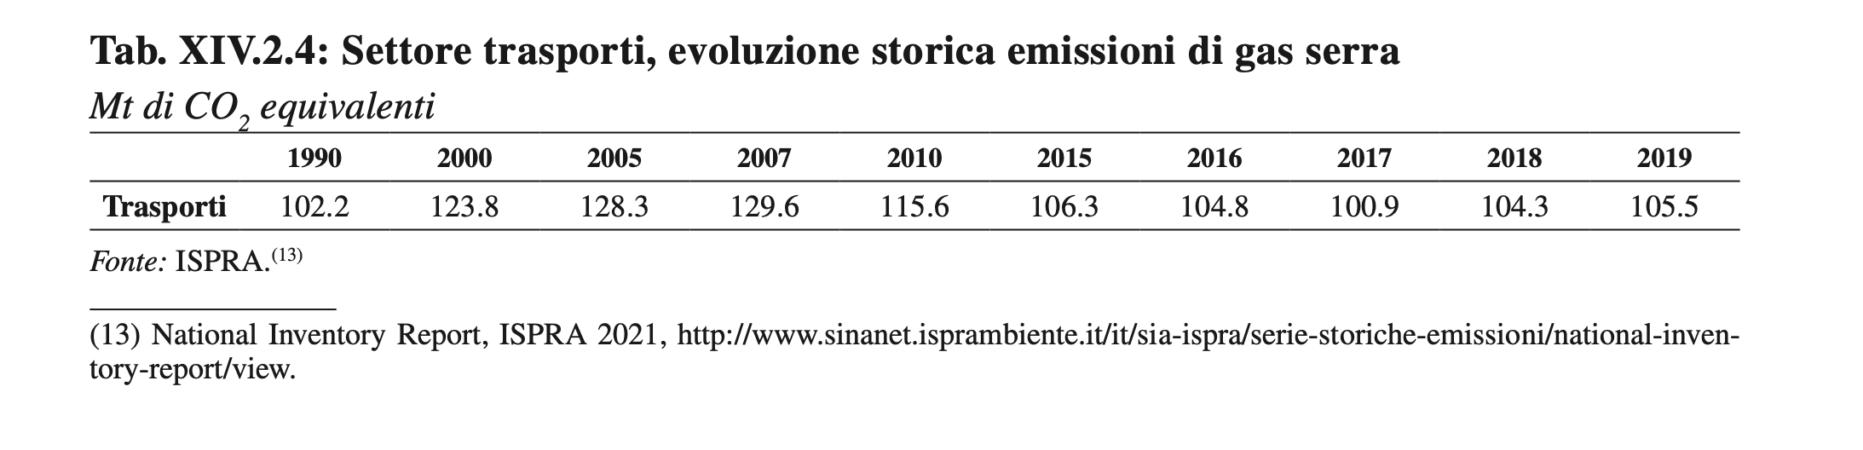 Settore trasporti evoluzione storica emissioni